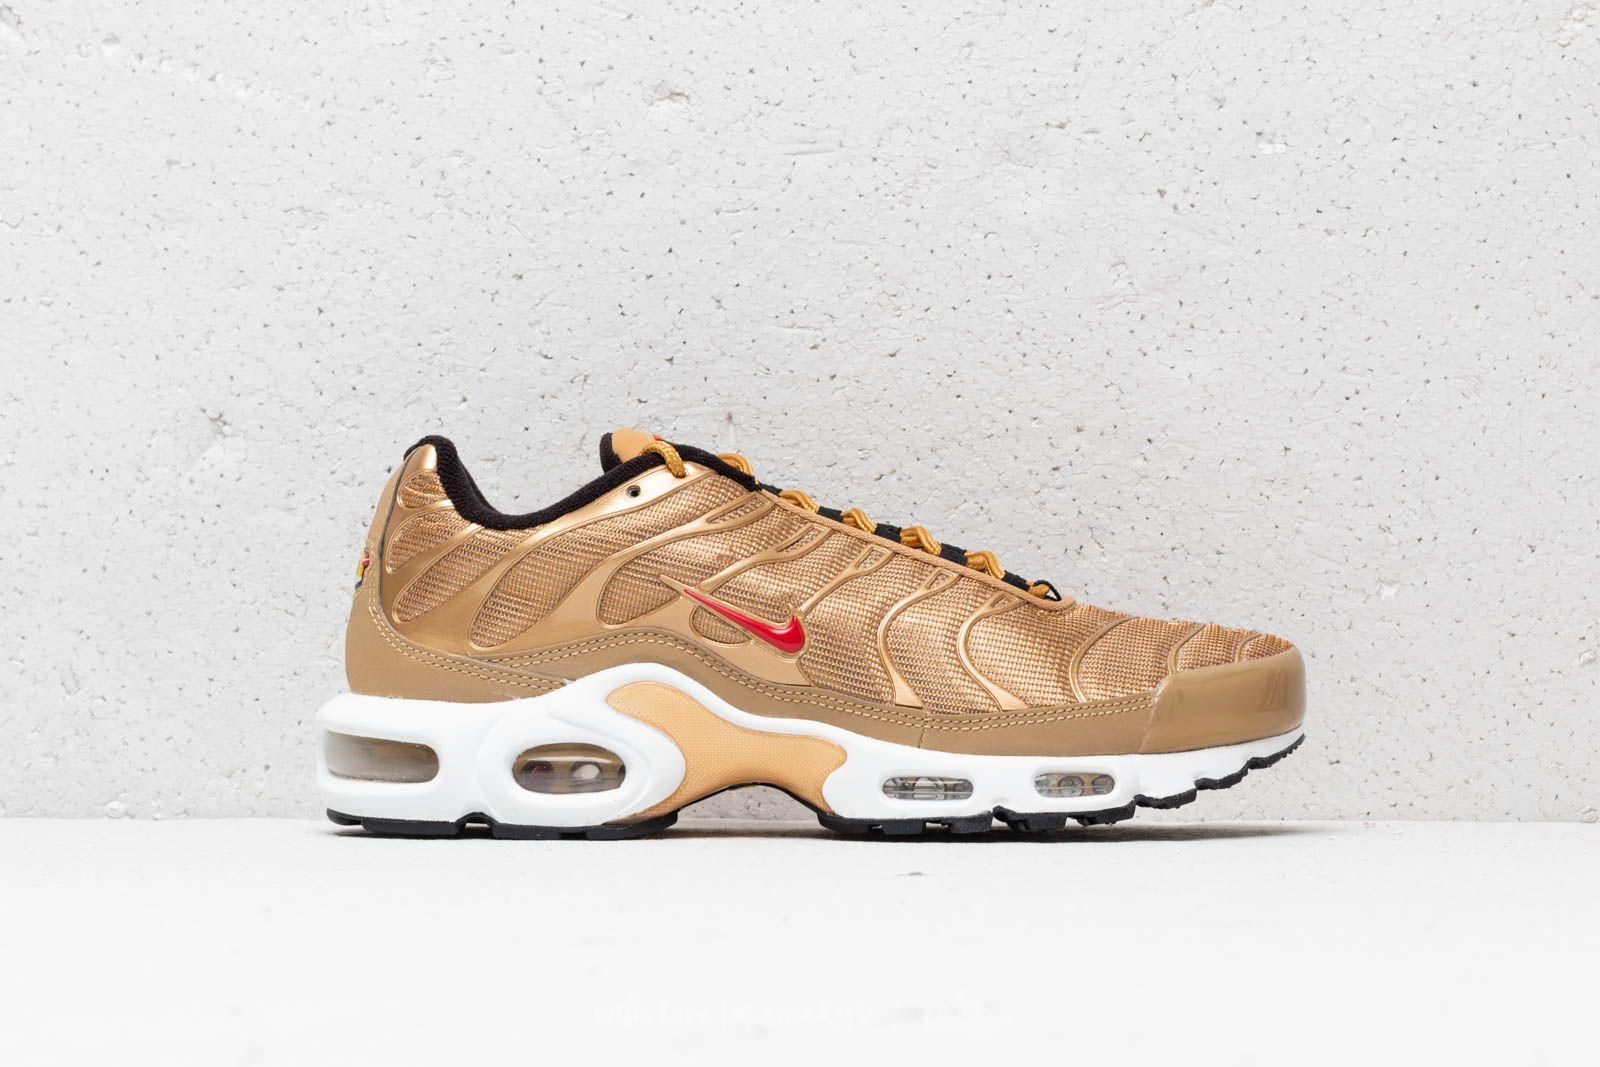 hot sales 8f974 0c444 Nike Air Max Plus QS Metallic Gold/ University Red | Footshop